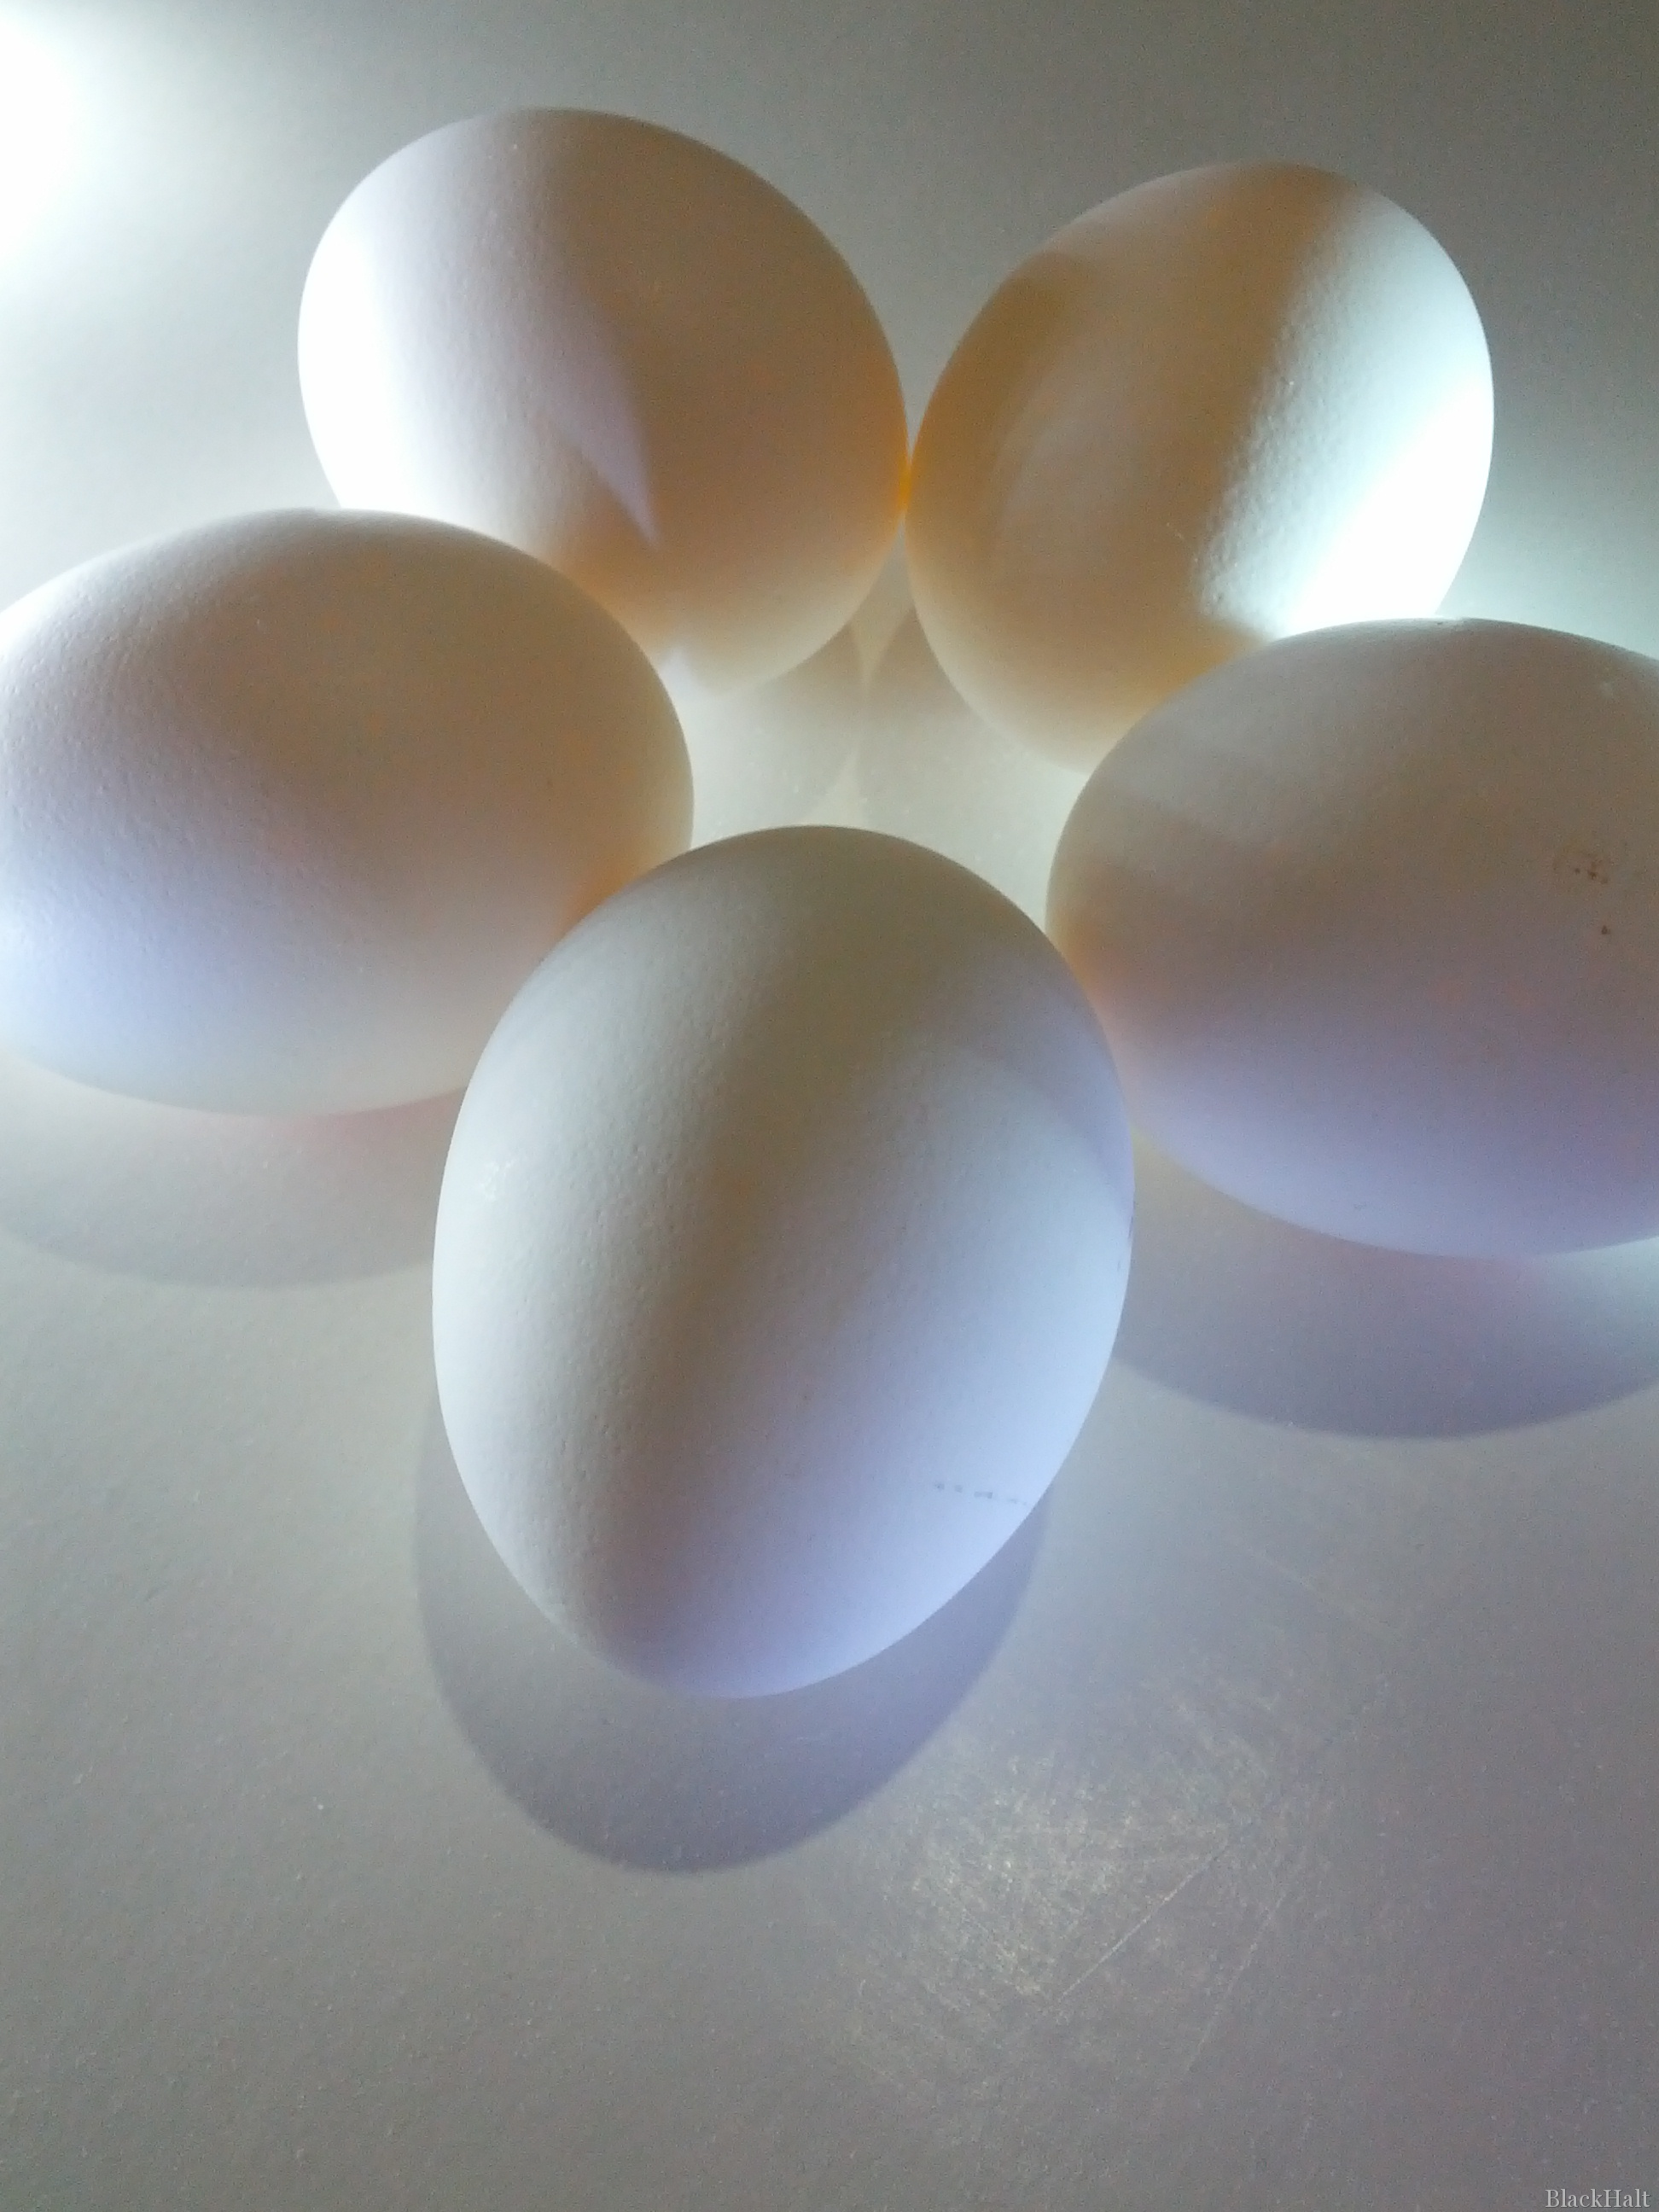 Lieldienu olas Nr.147